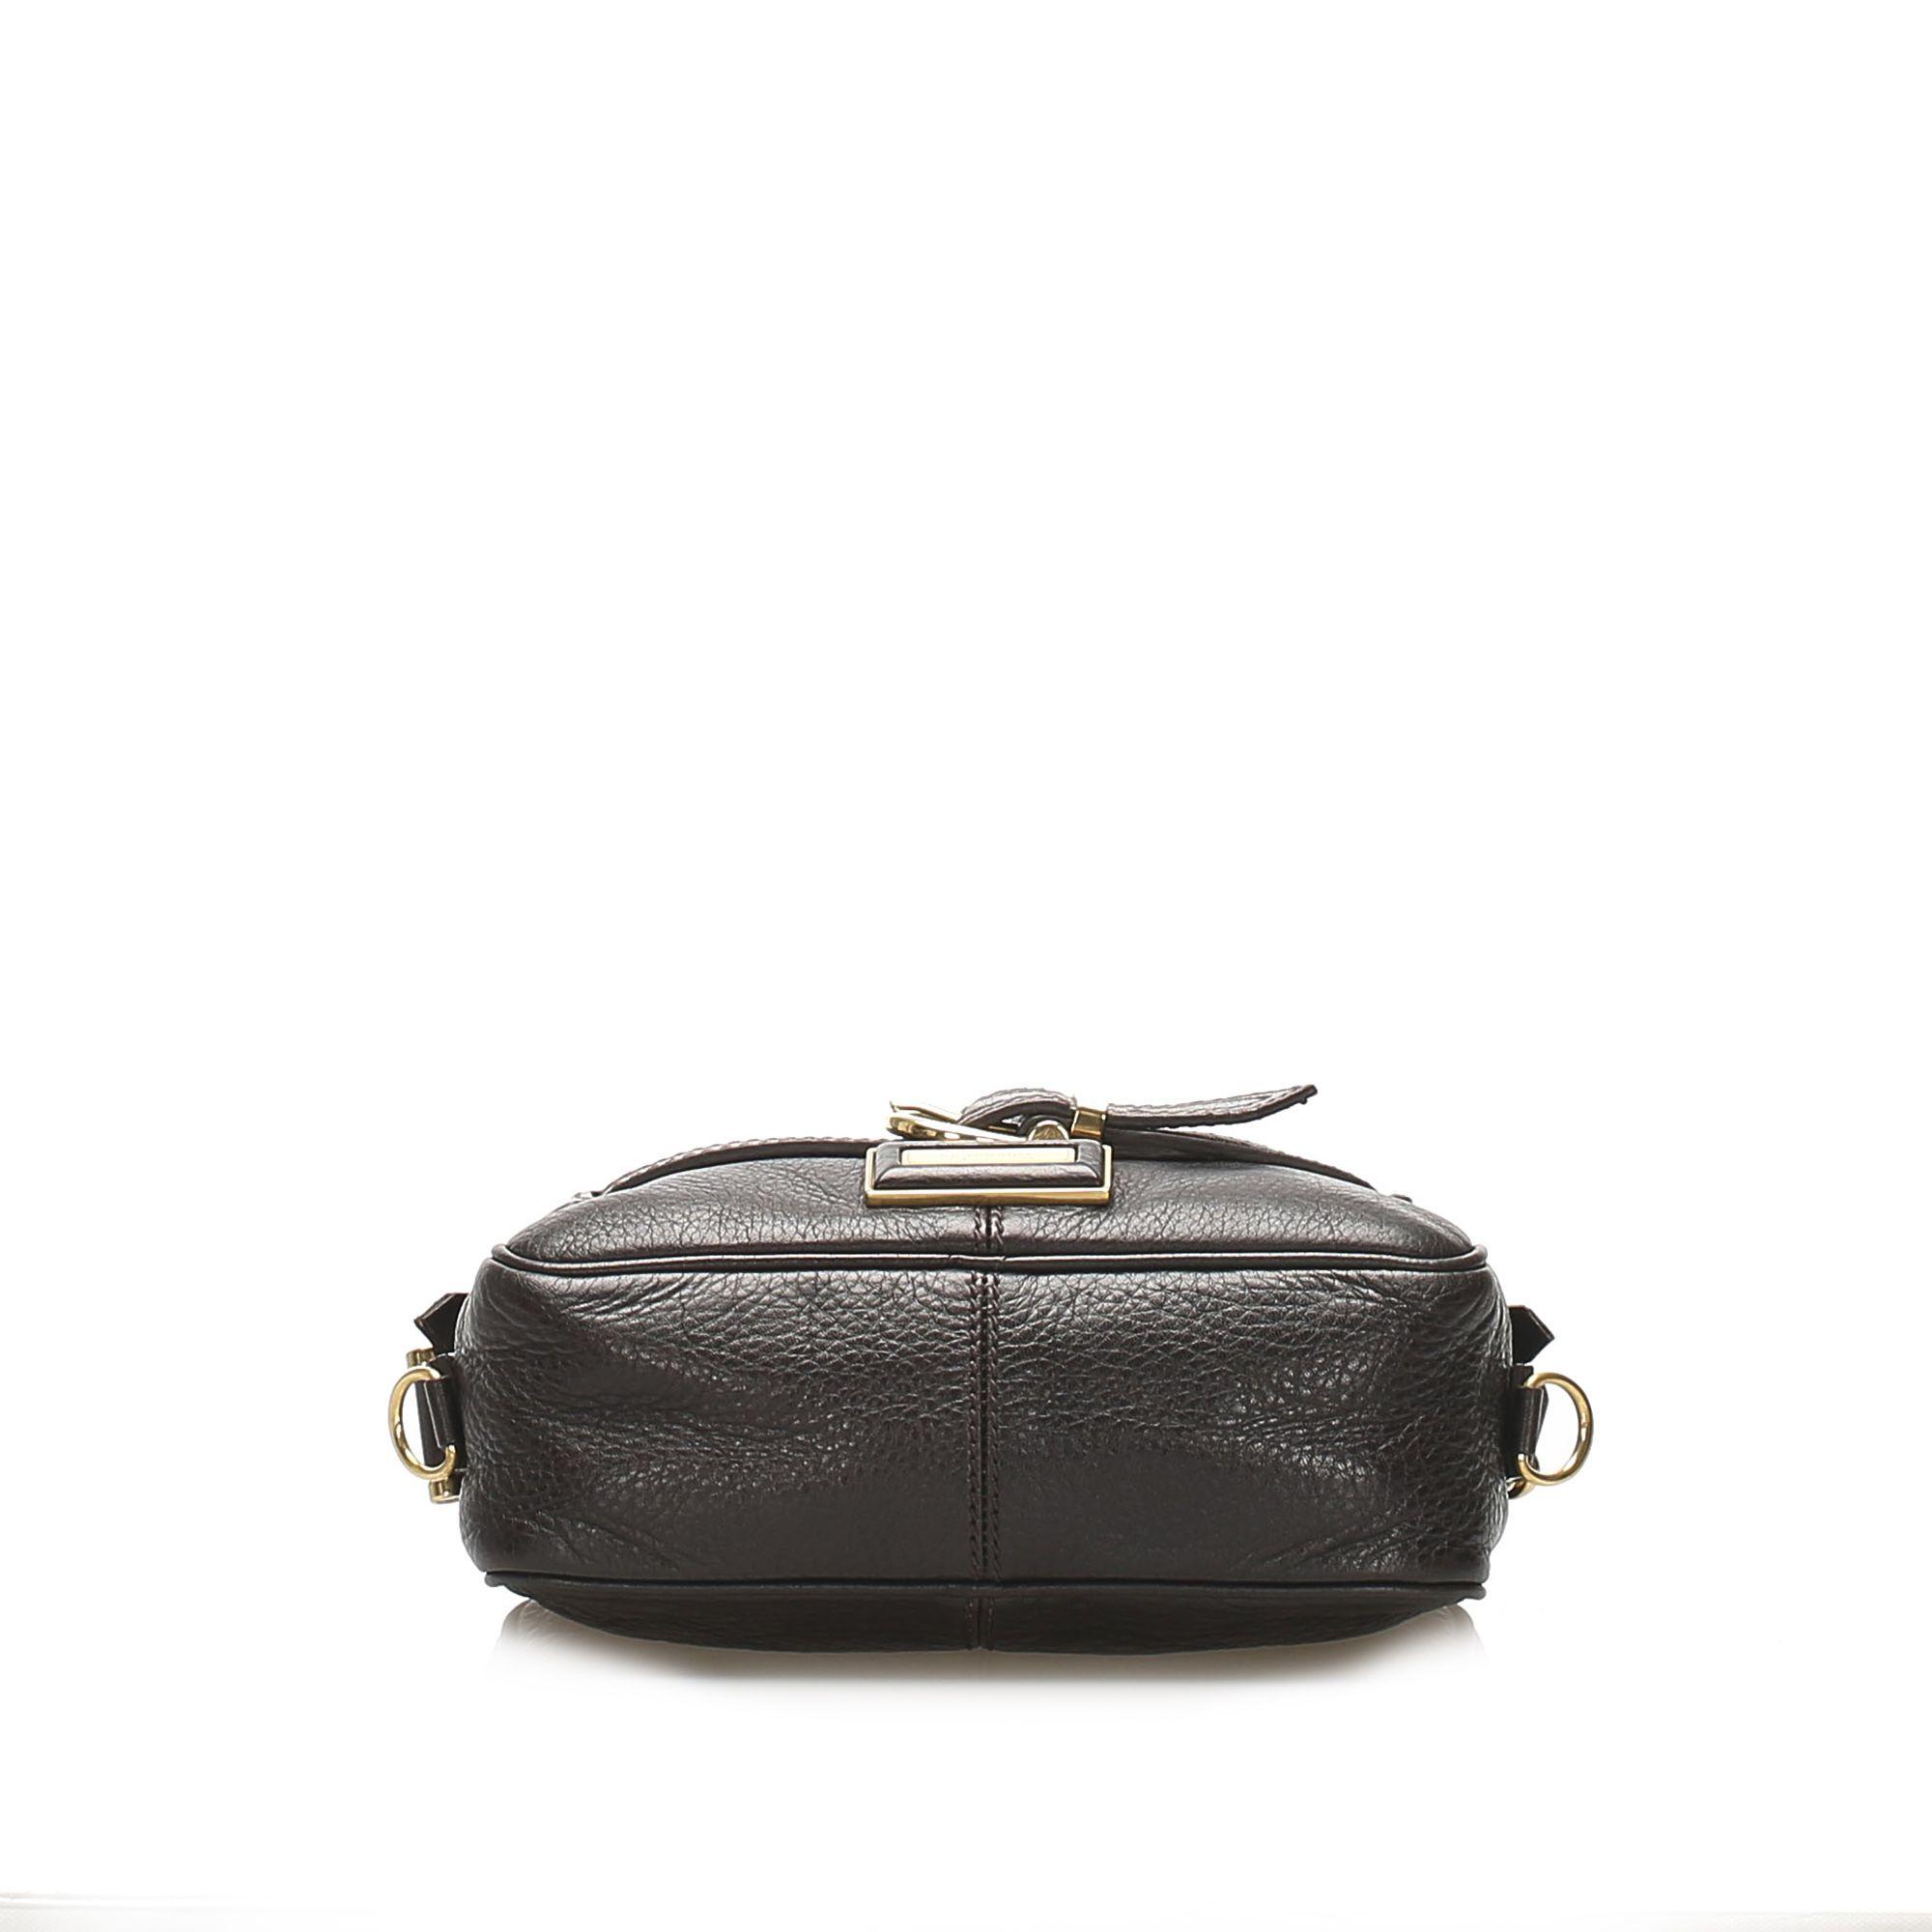 Vintage Burberry Leather Crossbody Bag Brown